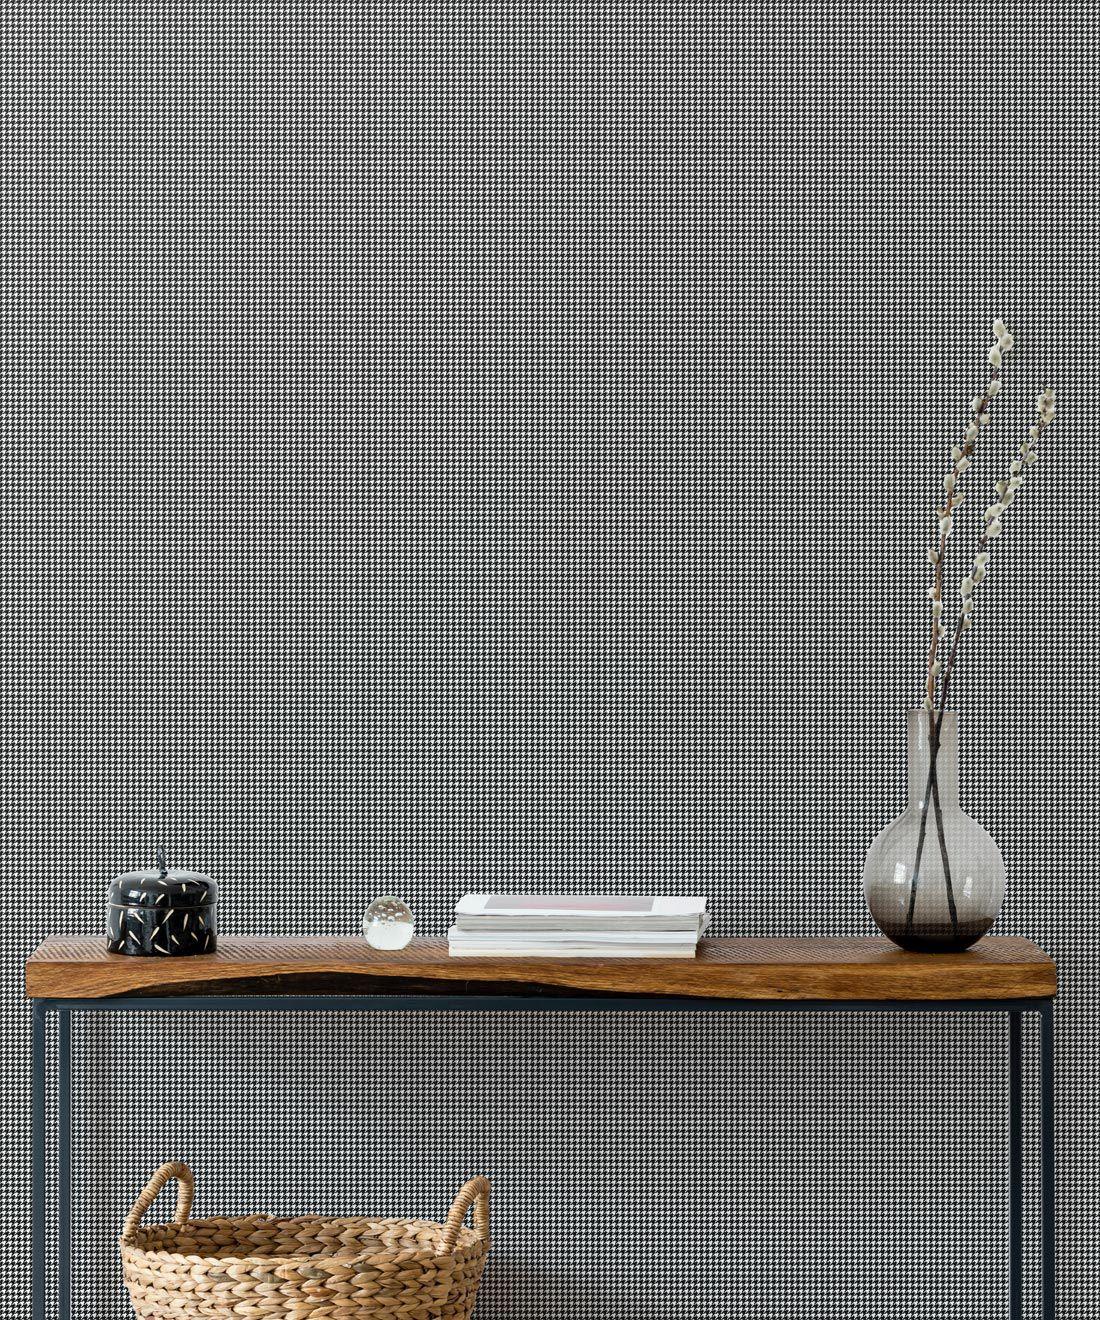 Houndstooth Wallpaper • Dogstooth Wallpaper • Black & White •Insitu